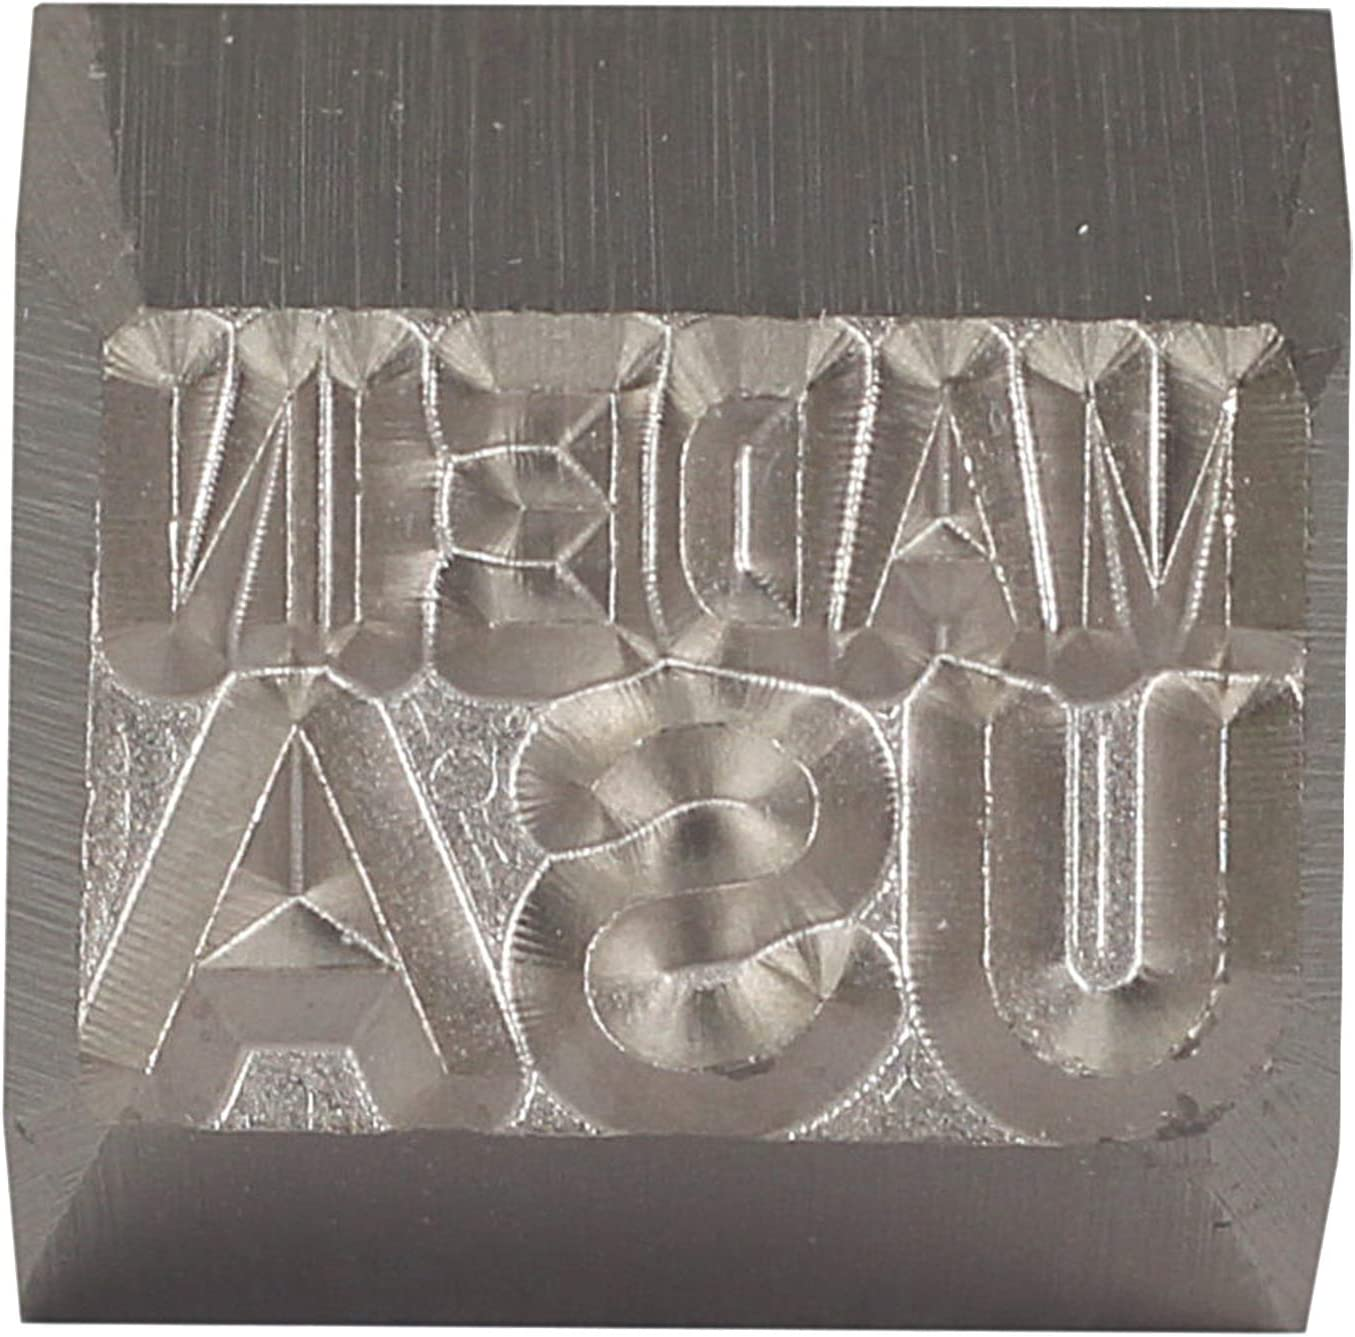 Pickardt Marking Tools Hand Stamp, Steel Stamp CNC-Engraved